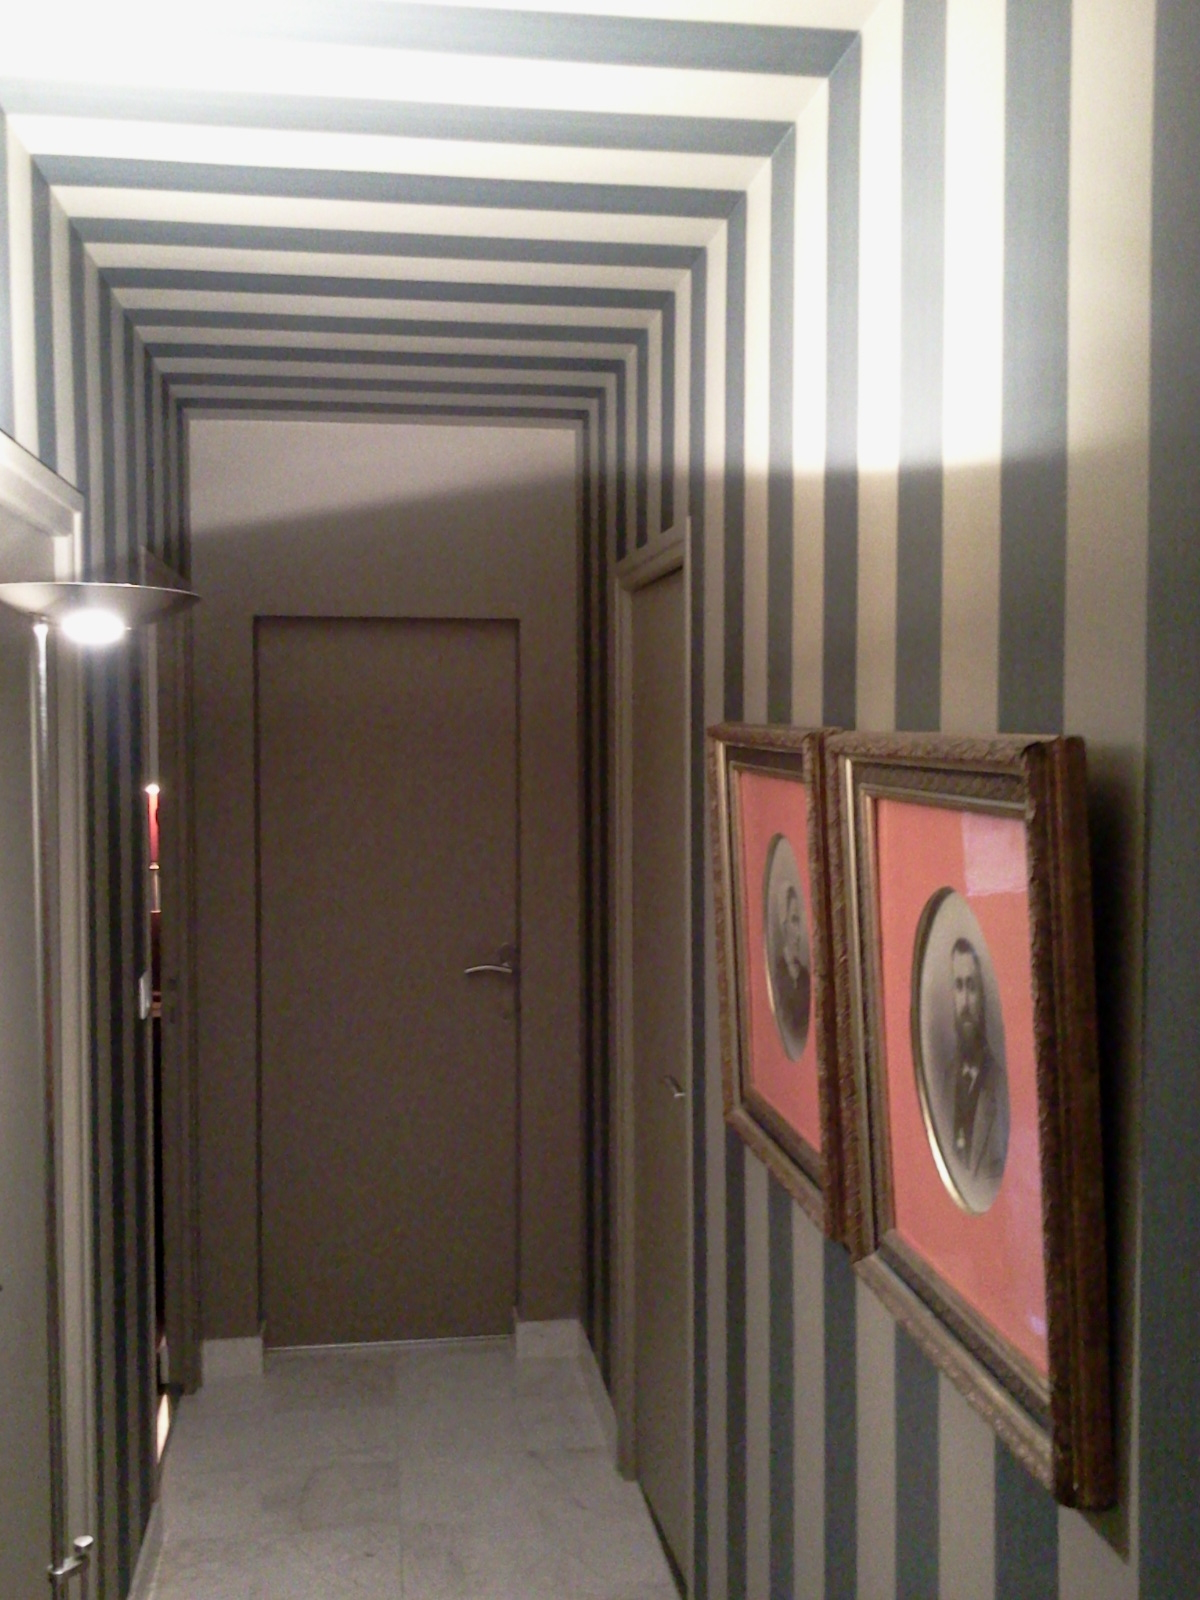 couleursetcontrastes-clisson-Beau rythme raye pour ce couloir